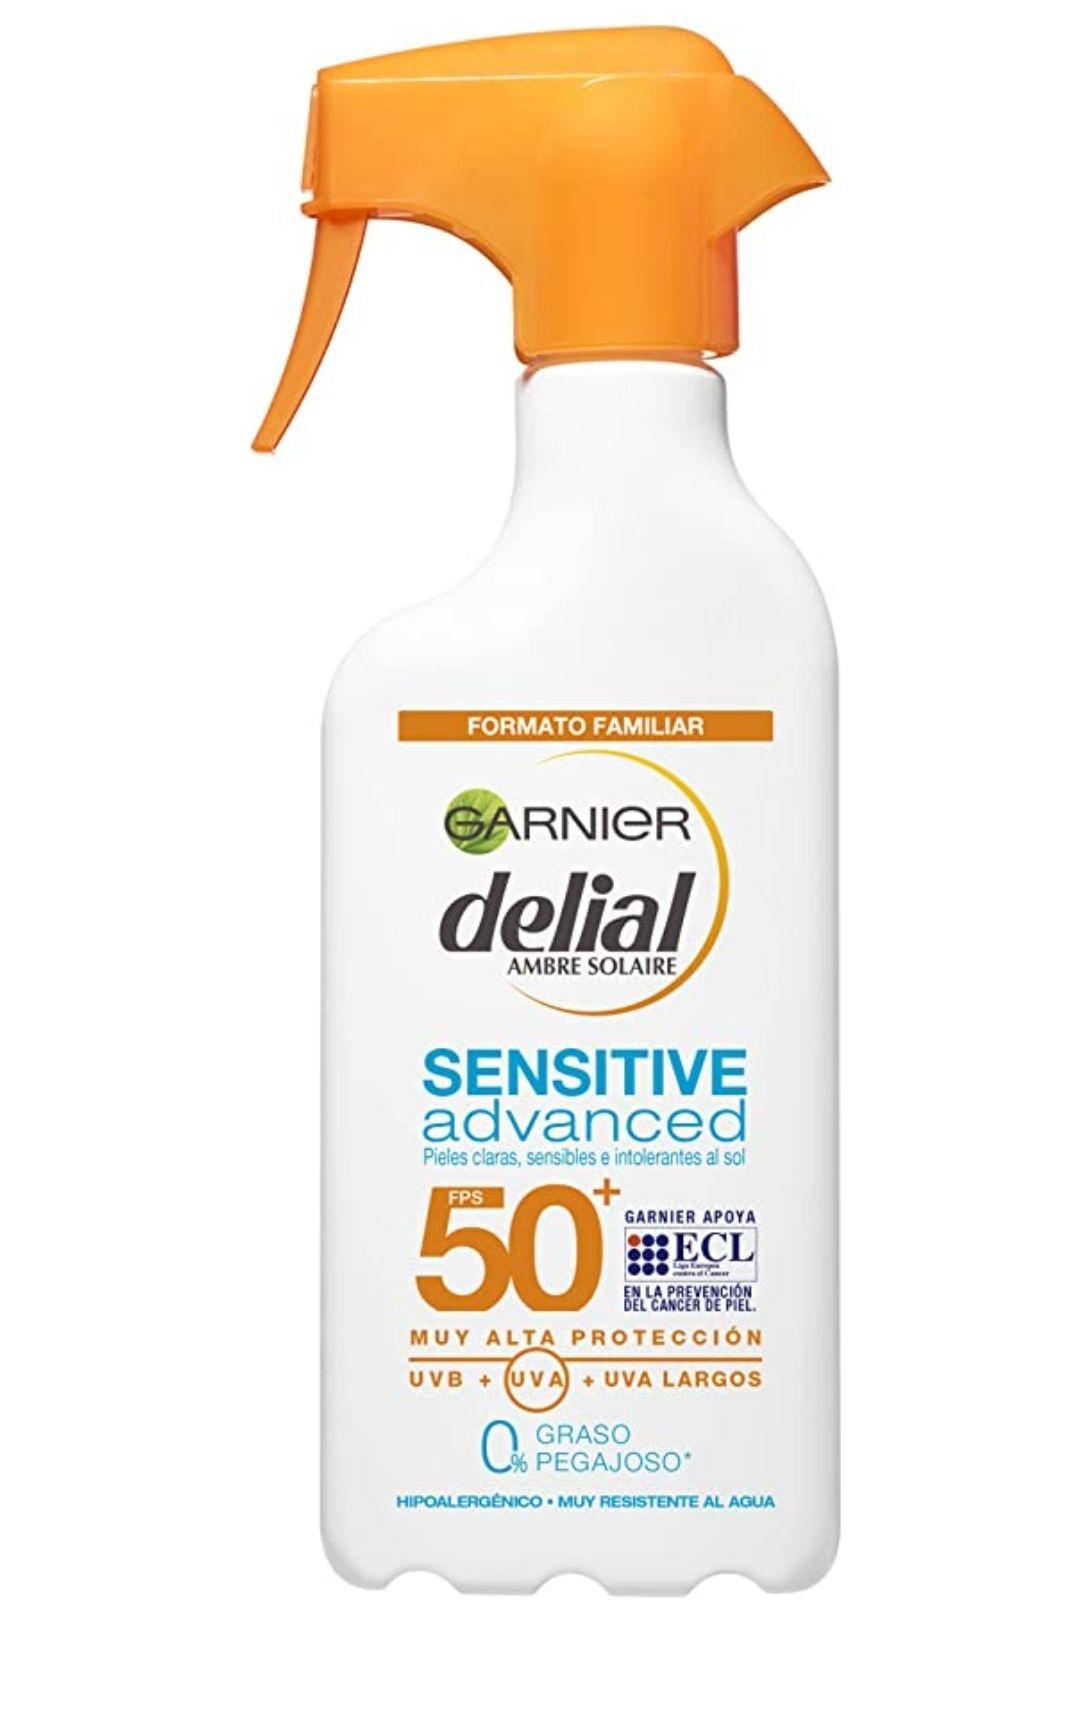 Garnier Protector Solar Spray Adultos Delial Sensitive Advanced para pieles claras, sensibles e intolerantes al sol, IP50+ - 300 ml